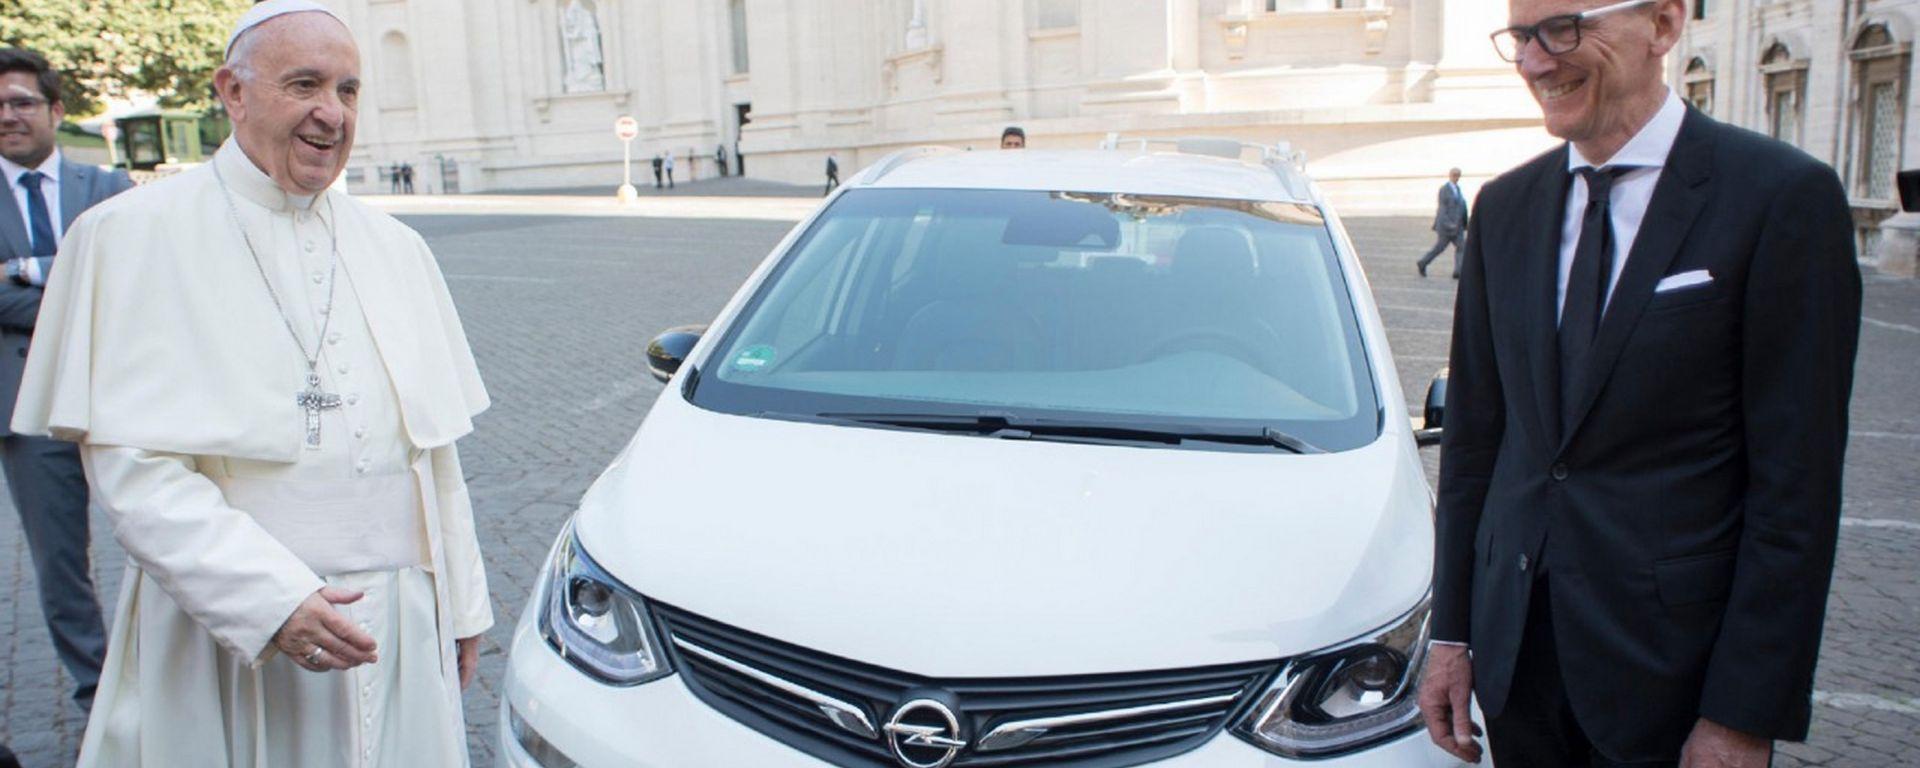 Papa Francesco ha ricevuto una nuova Opel Ampera-e